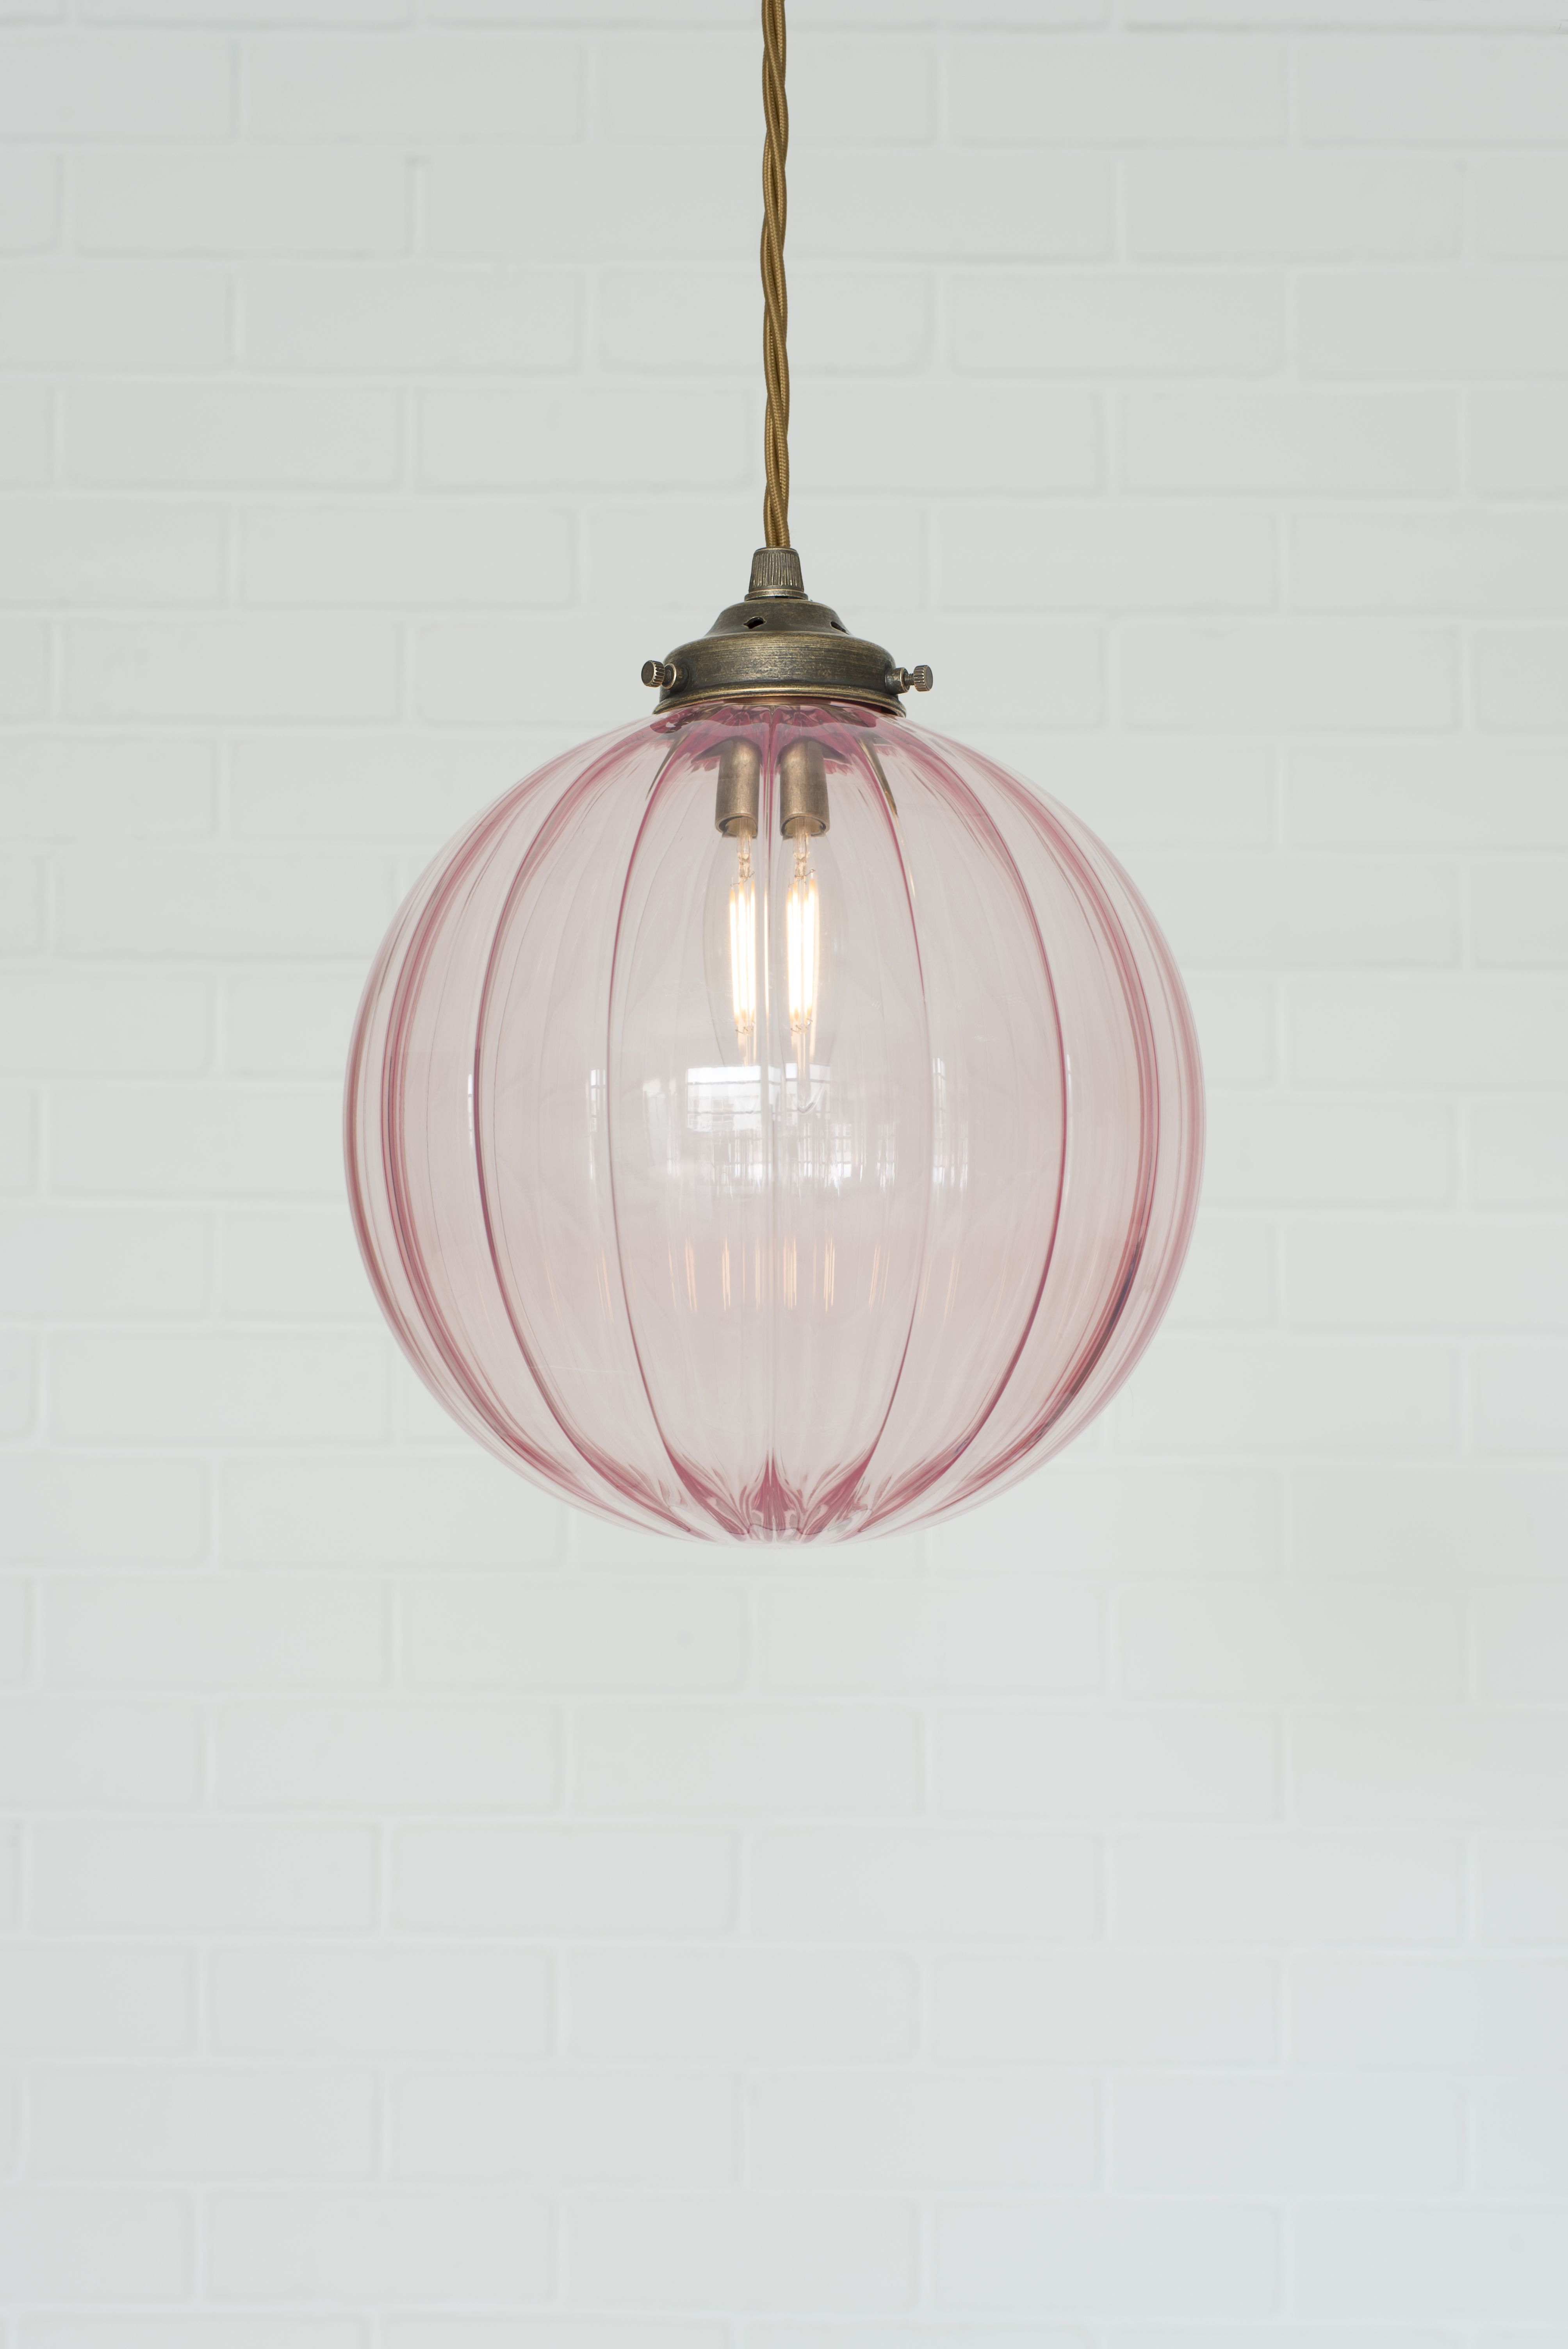 Dusky Pink Glass Fulbourn Pendant Light by Jim Lawrence  Glass